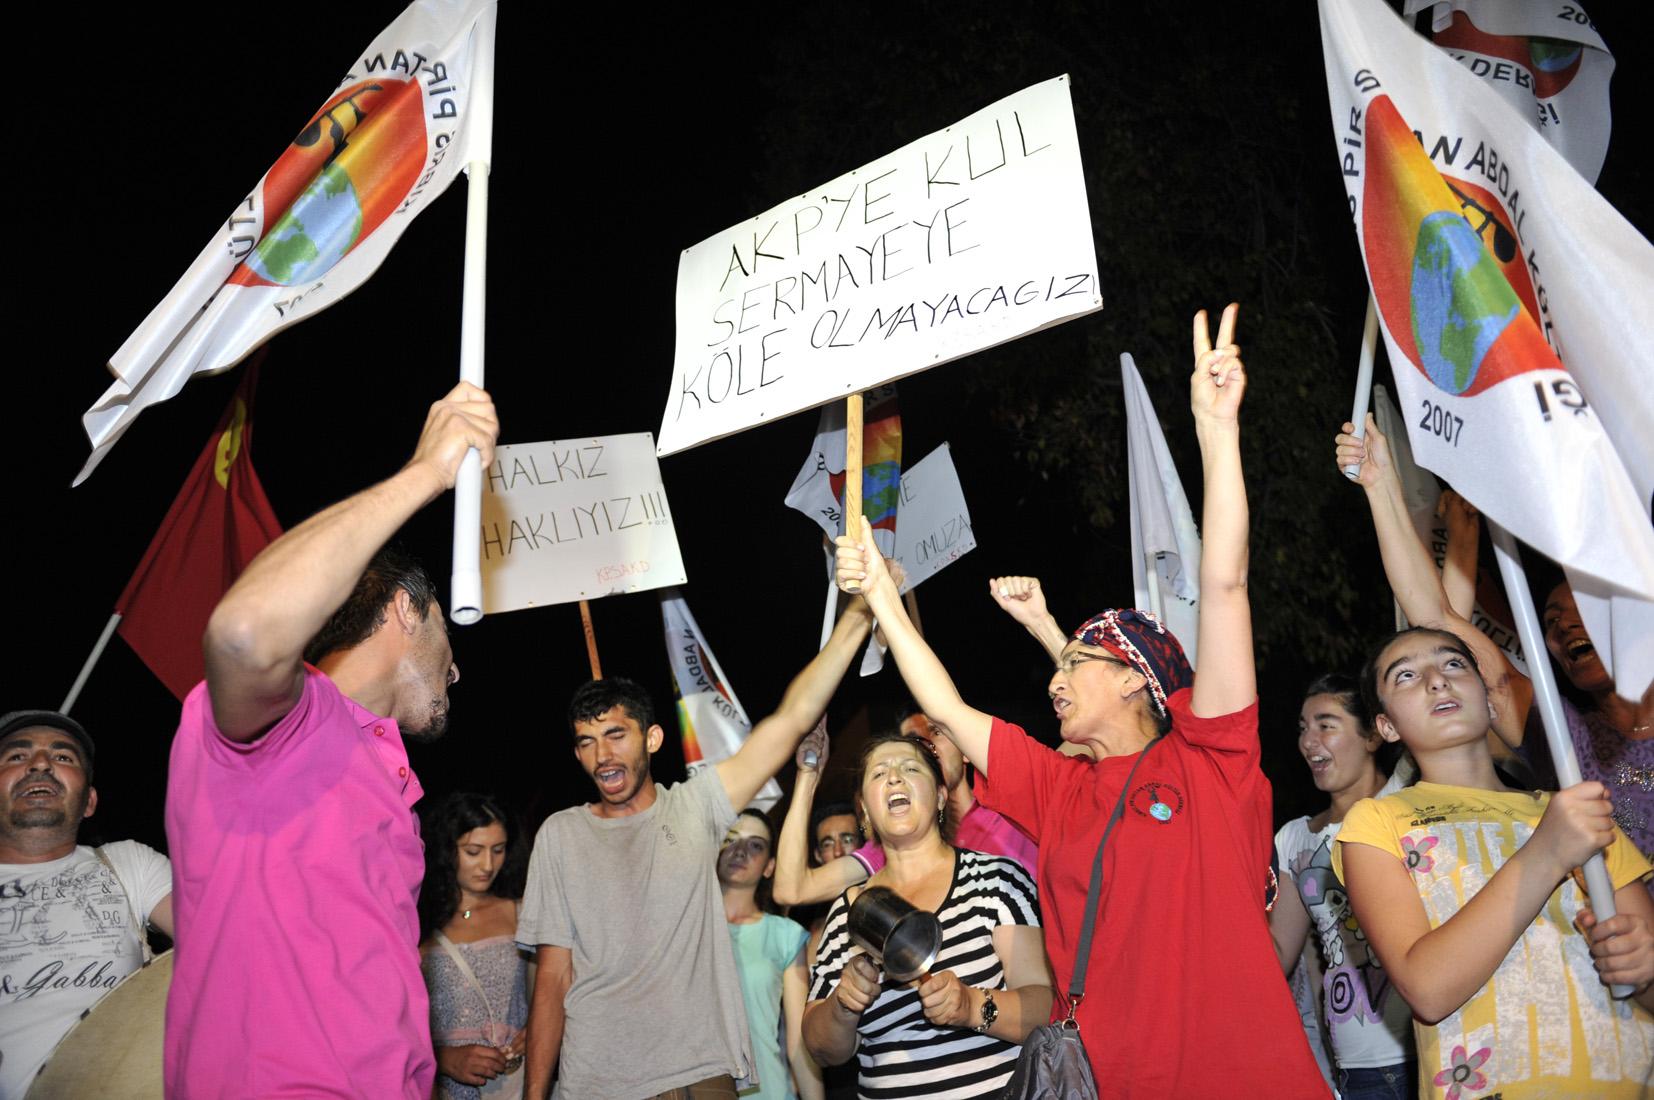 SENDİKAL PLATFORM GEZİ PARKI PROTESTOCULARINA DESTEK AMAÇLI EYLEM DÜZENLEDİ